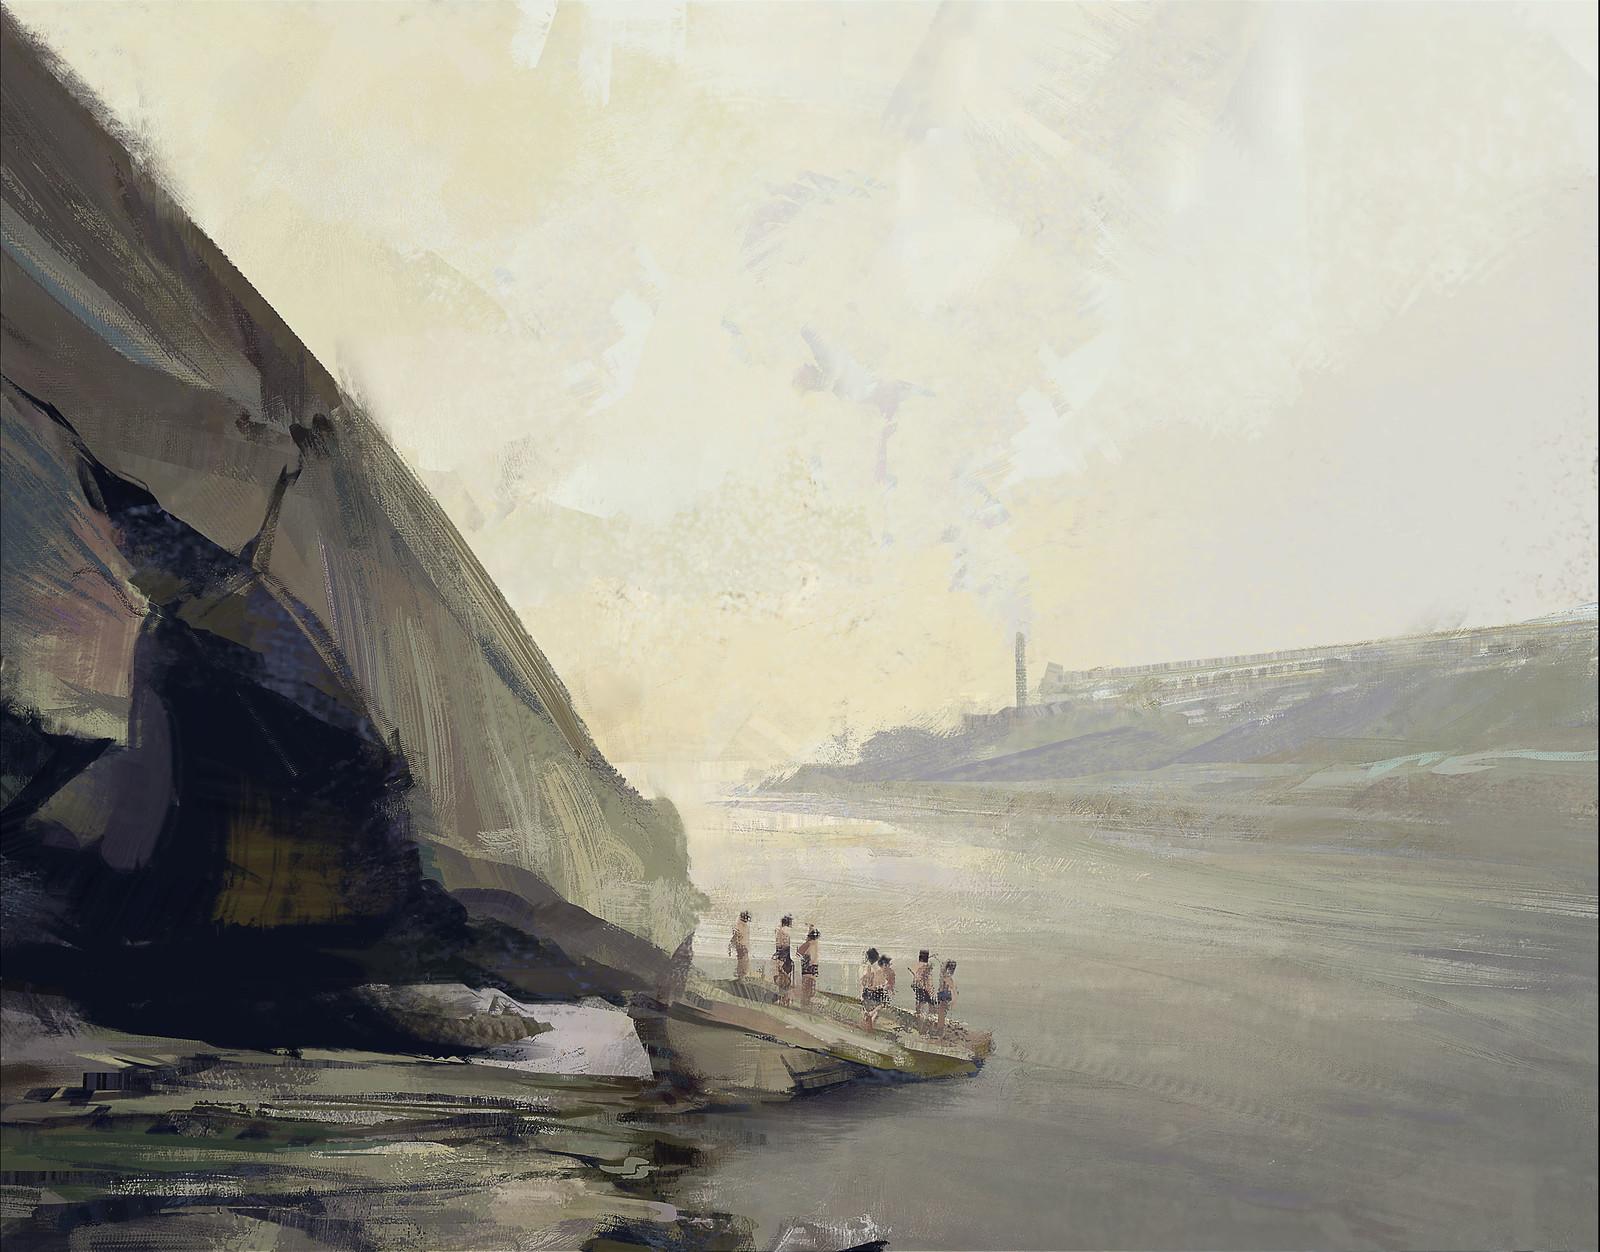 Yangtze swimmers study